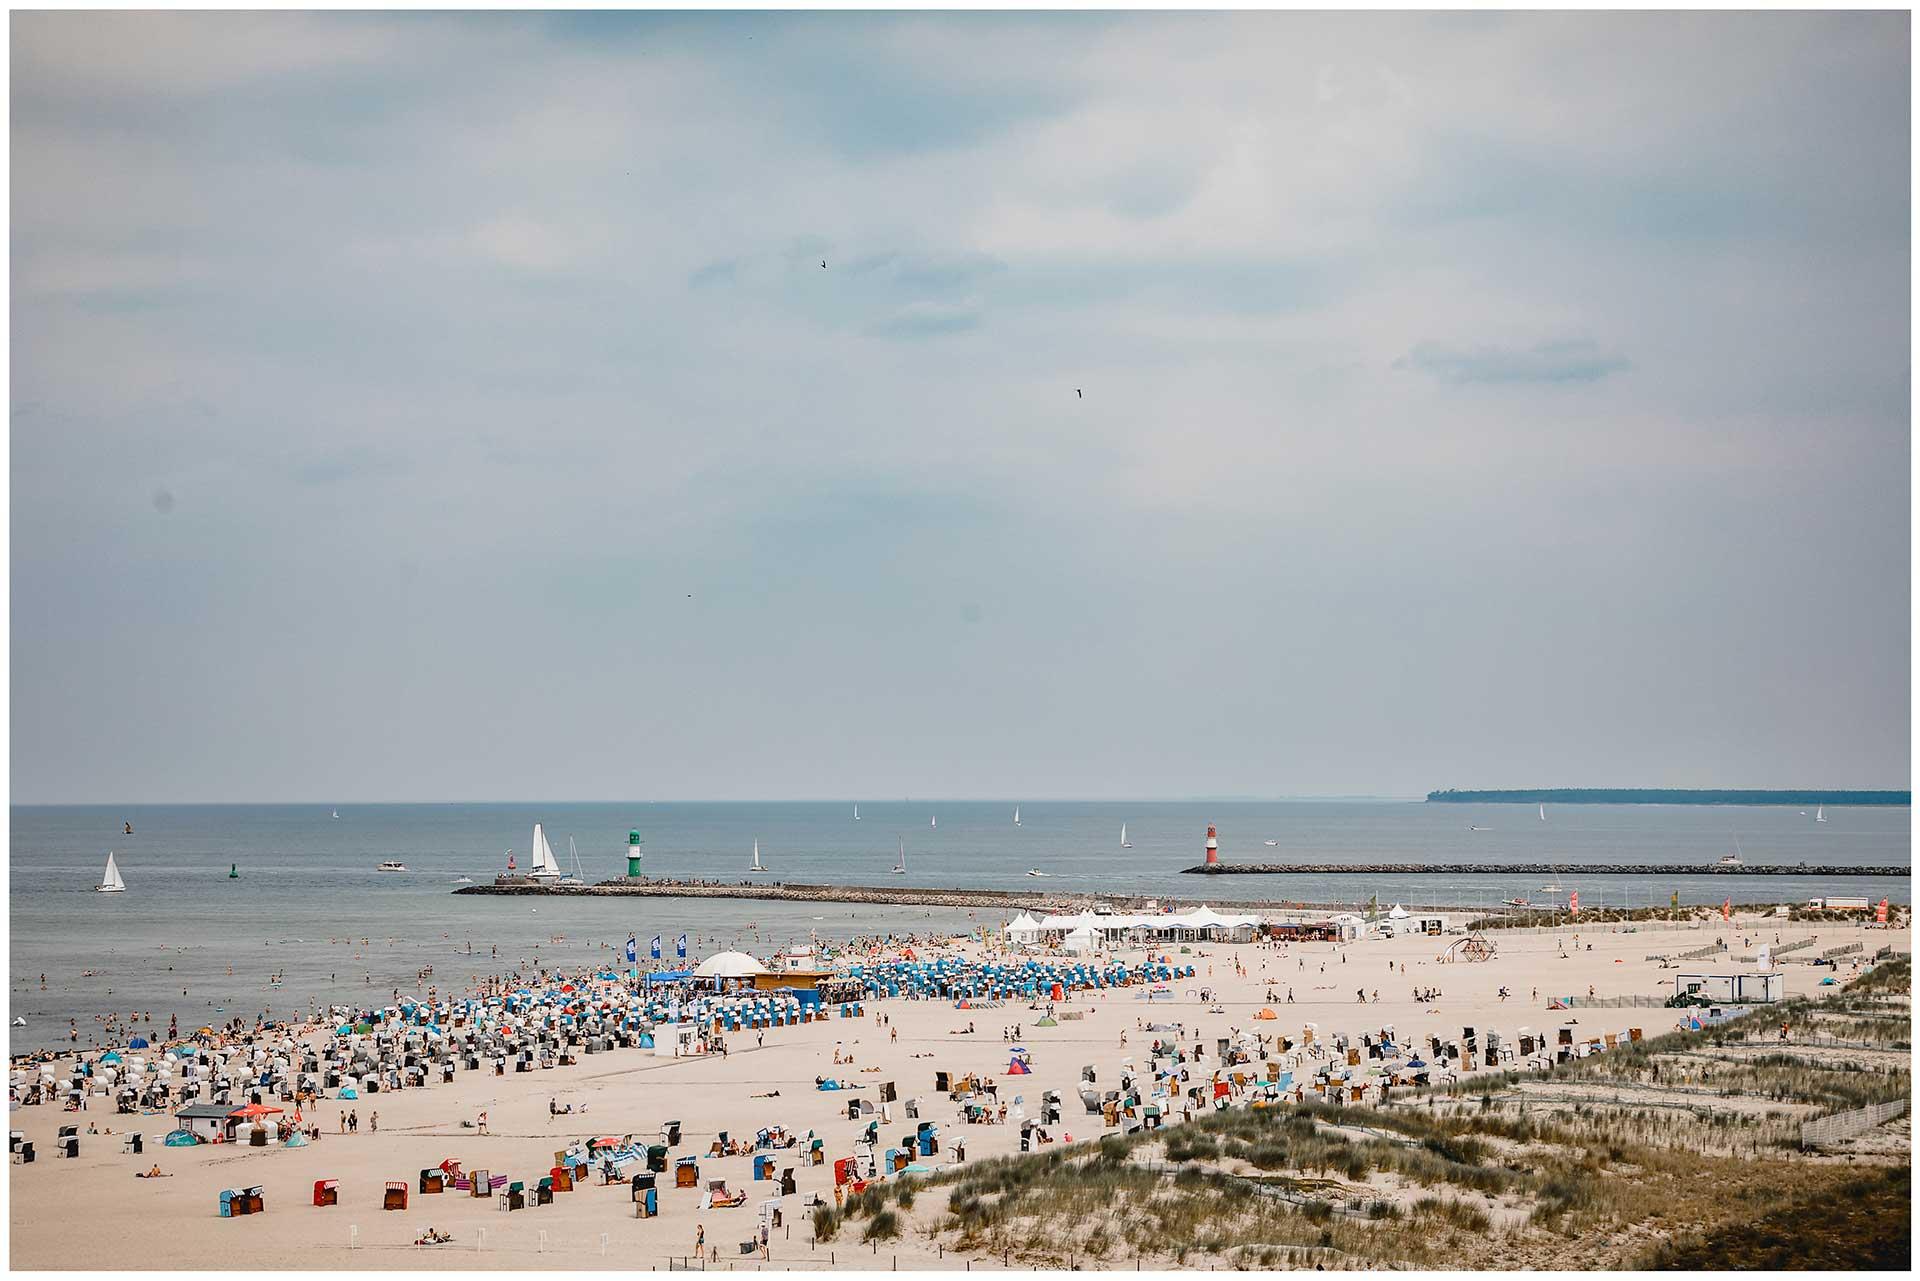 Blick-über-den-Warnemünder-Strand-Hochzeitsfotograf-Warnemuende-Rostock-Hochzeitsfotograf-Ostseebad-Warnemünde